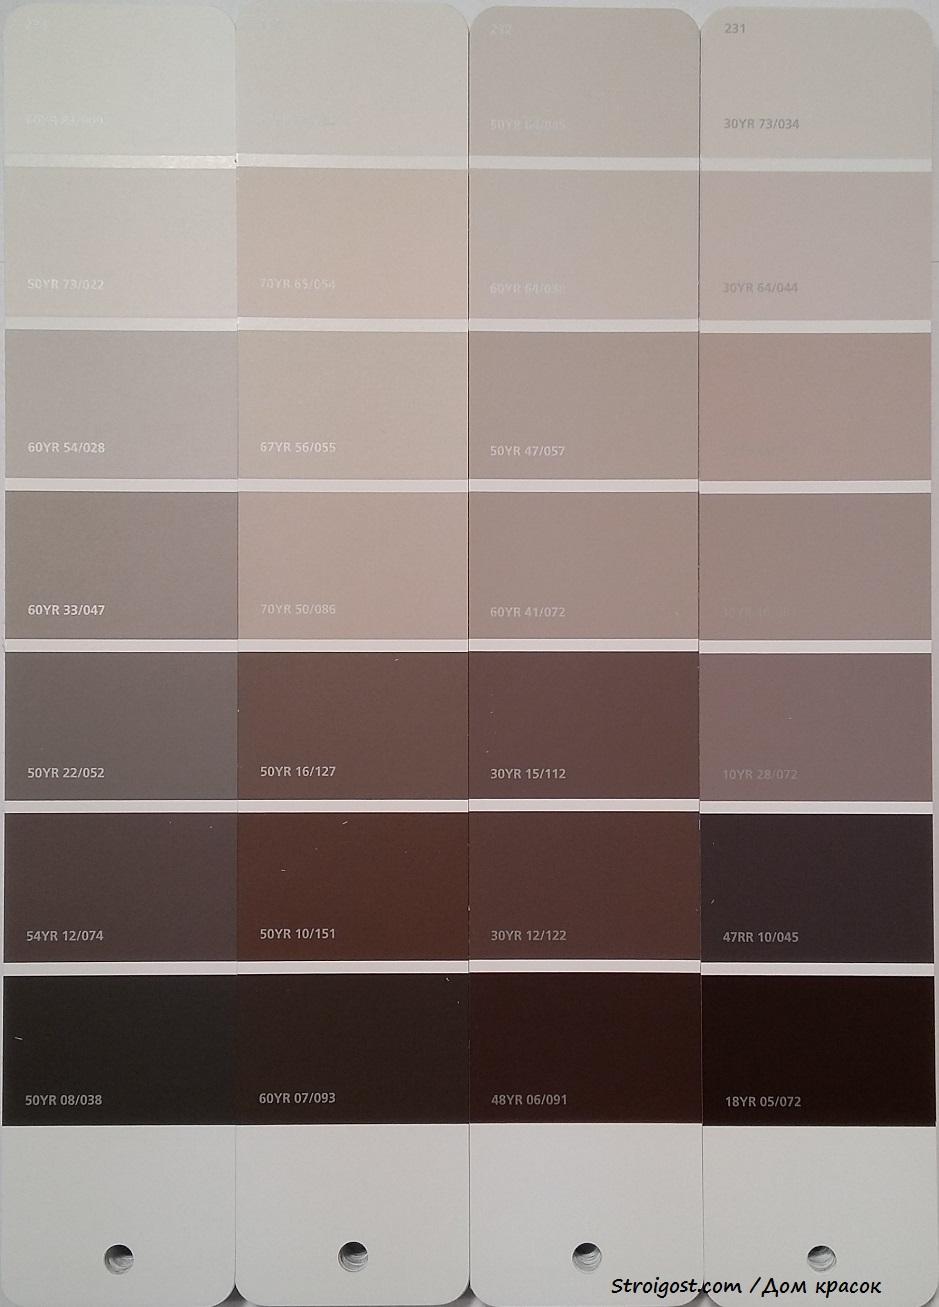 доставка палетка краски для стен фото картинки желаем успехов, везения